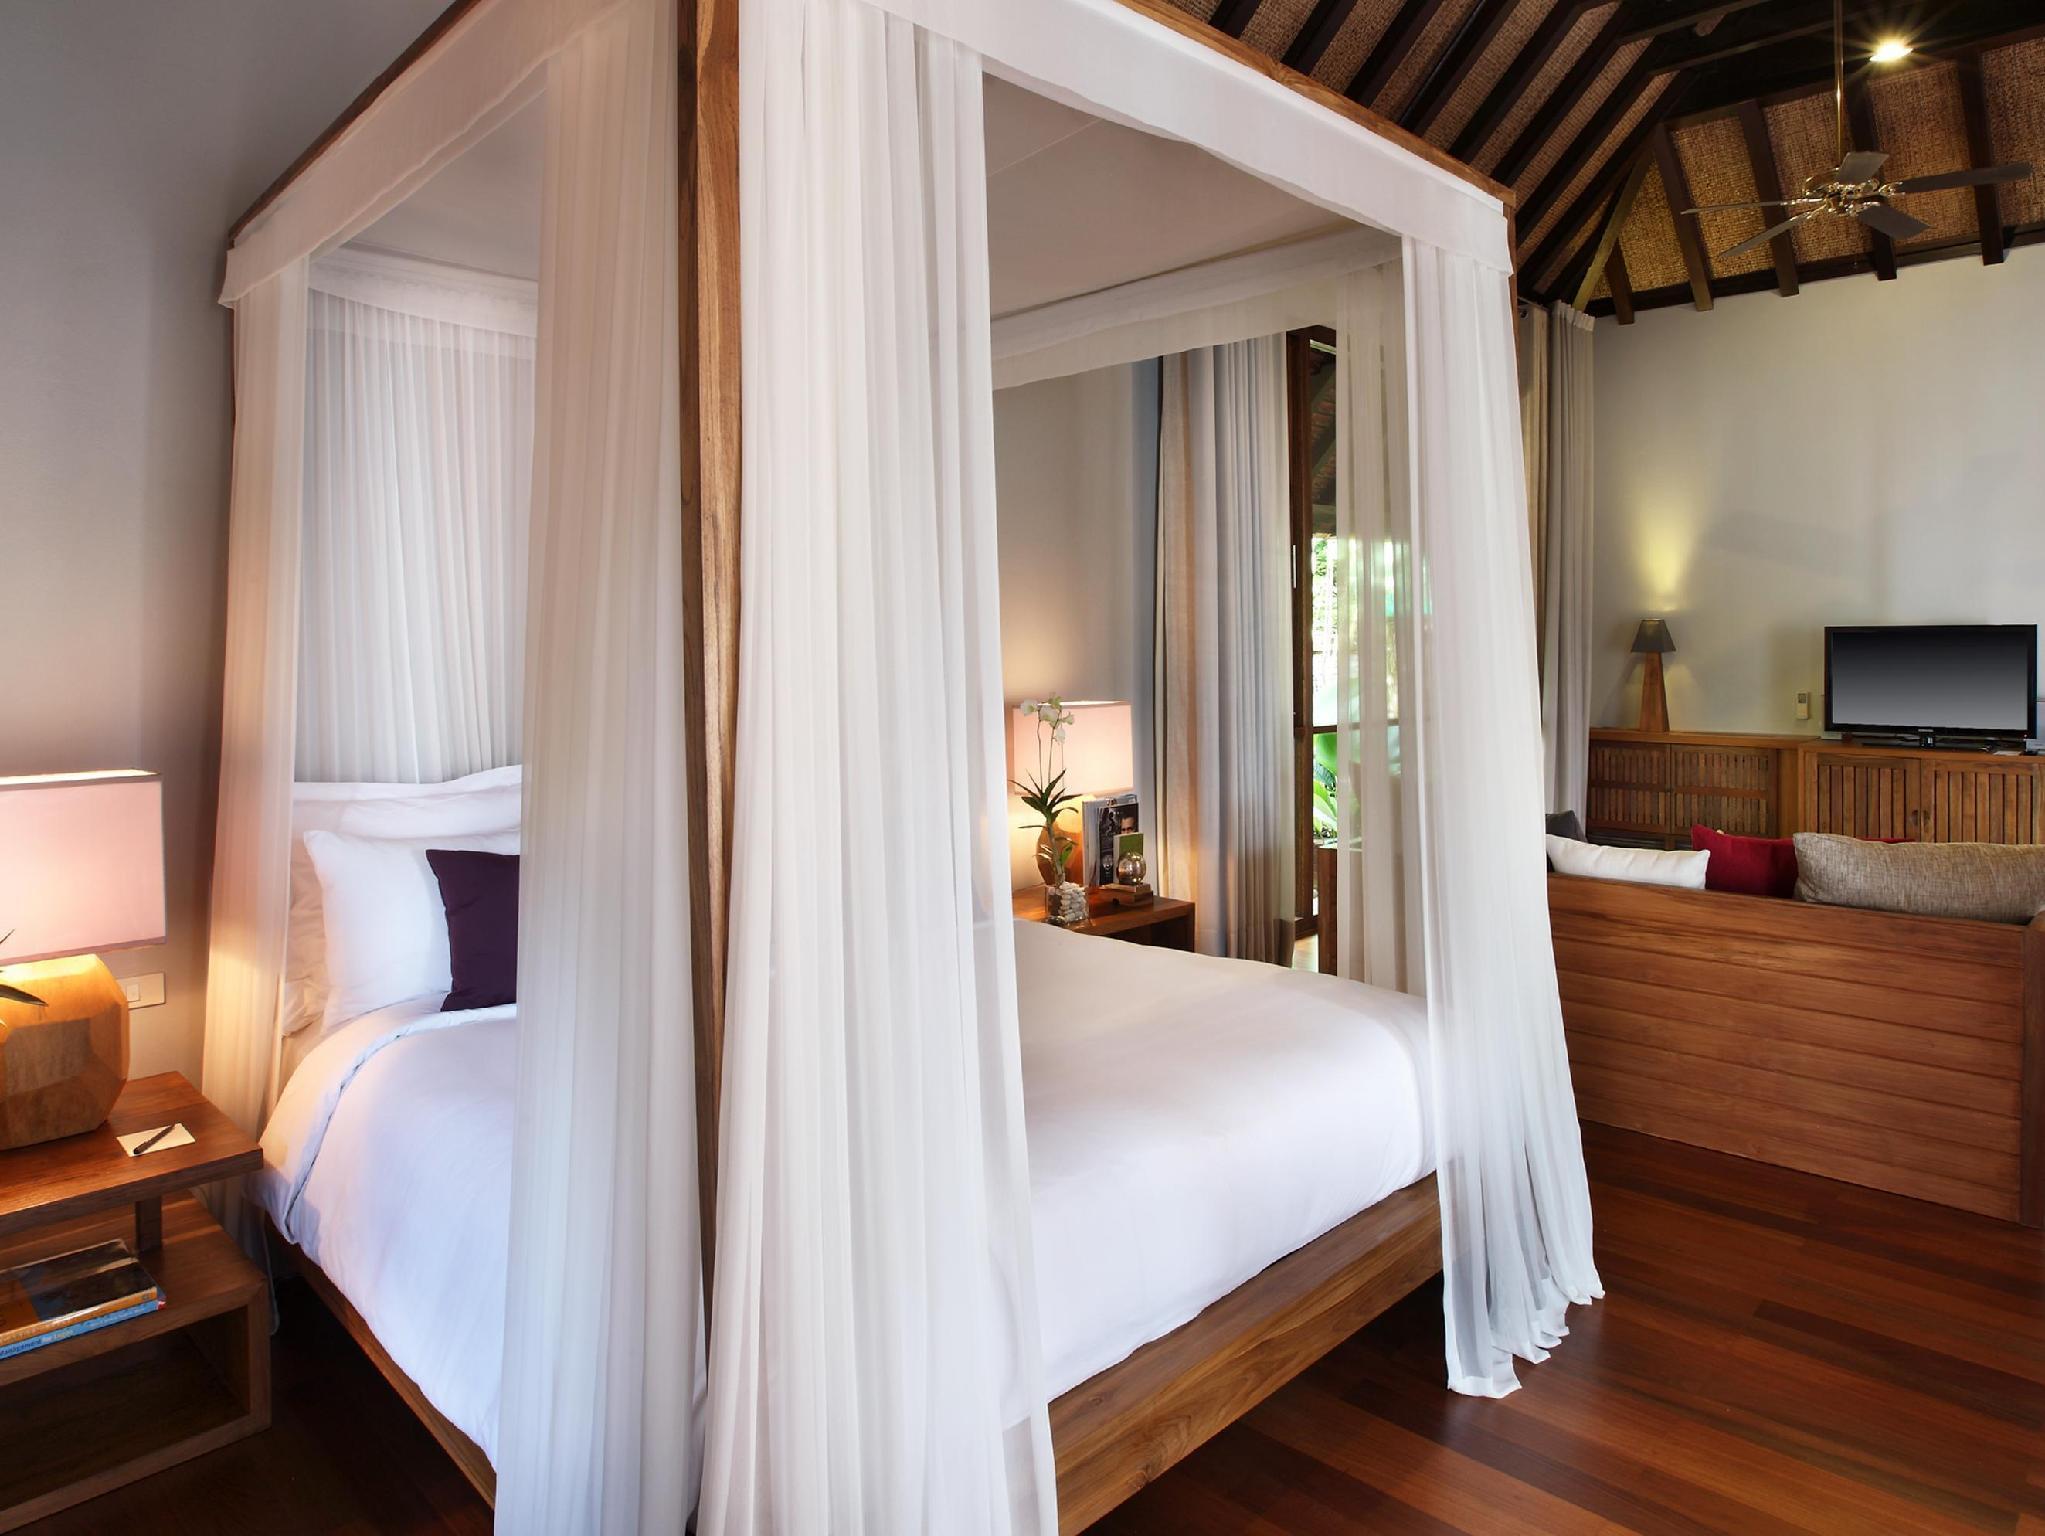 Renaissance Koh Samui Resort & Spa เรอแนสซองซ์ เกาะสมุย รีสอร์ท แอนด์ สปา